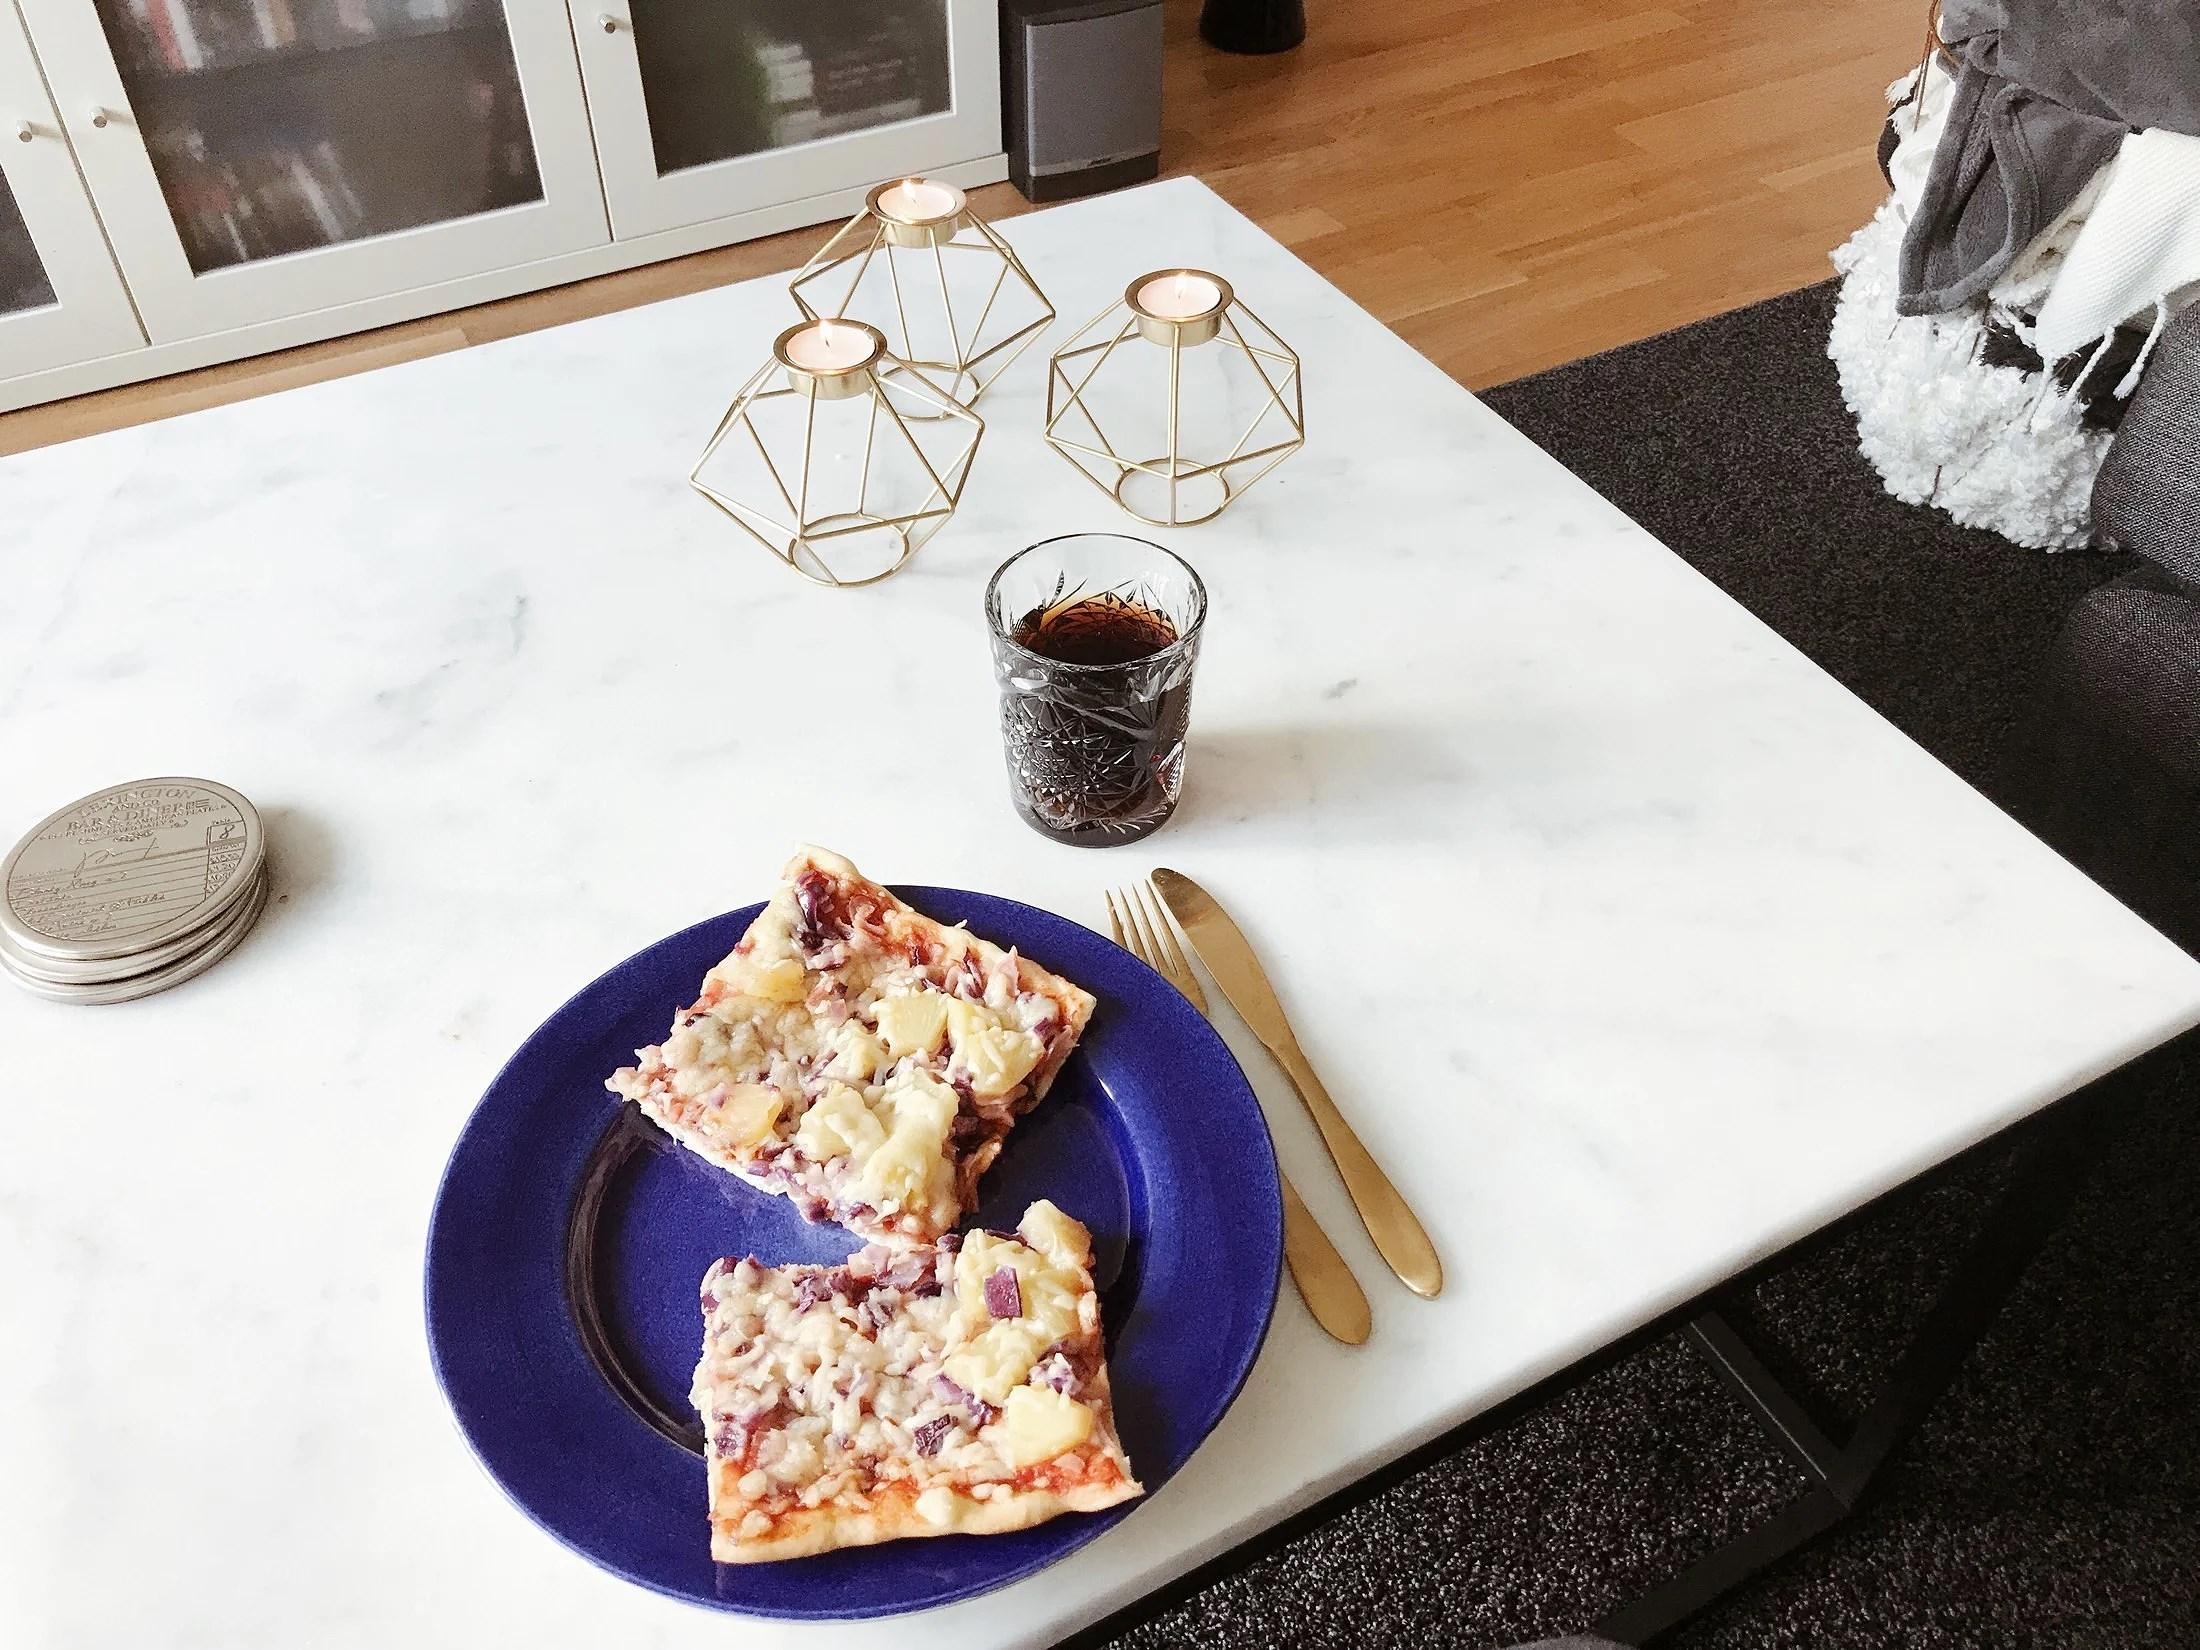 hemmagjord pizza, igen